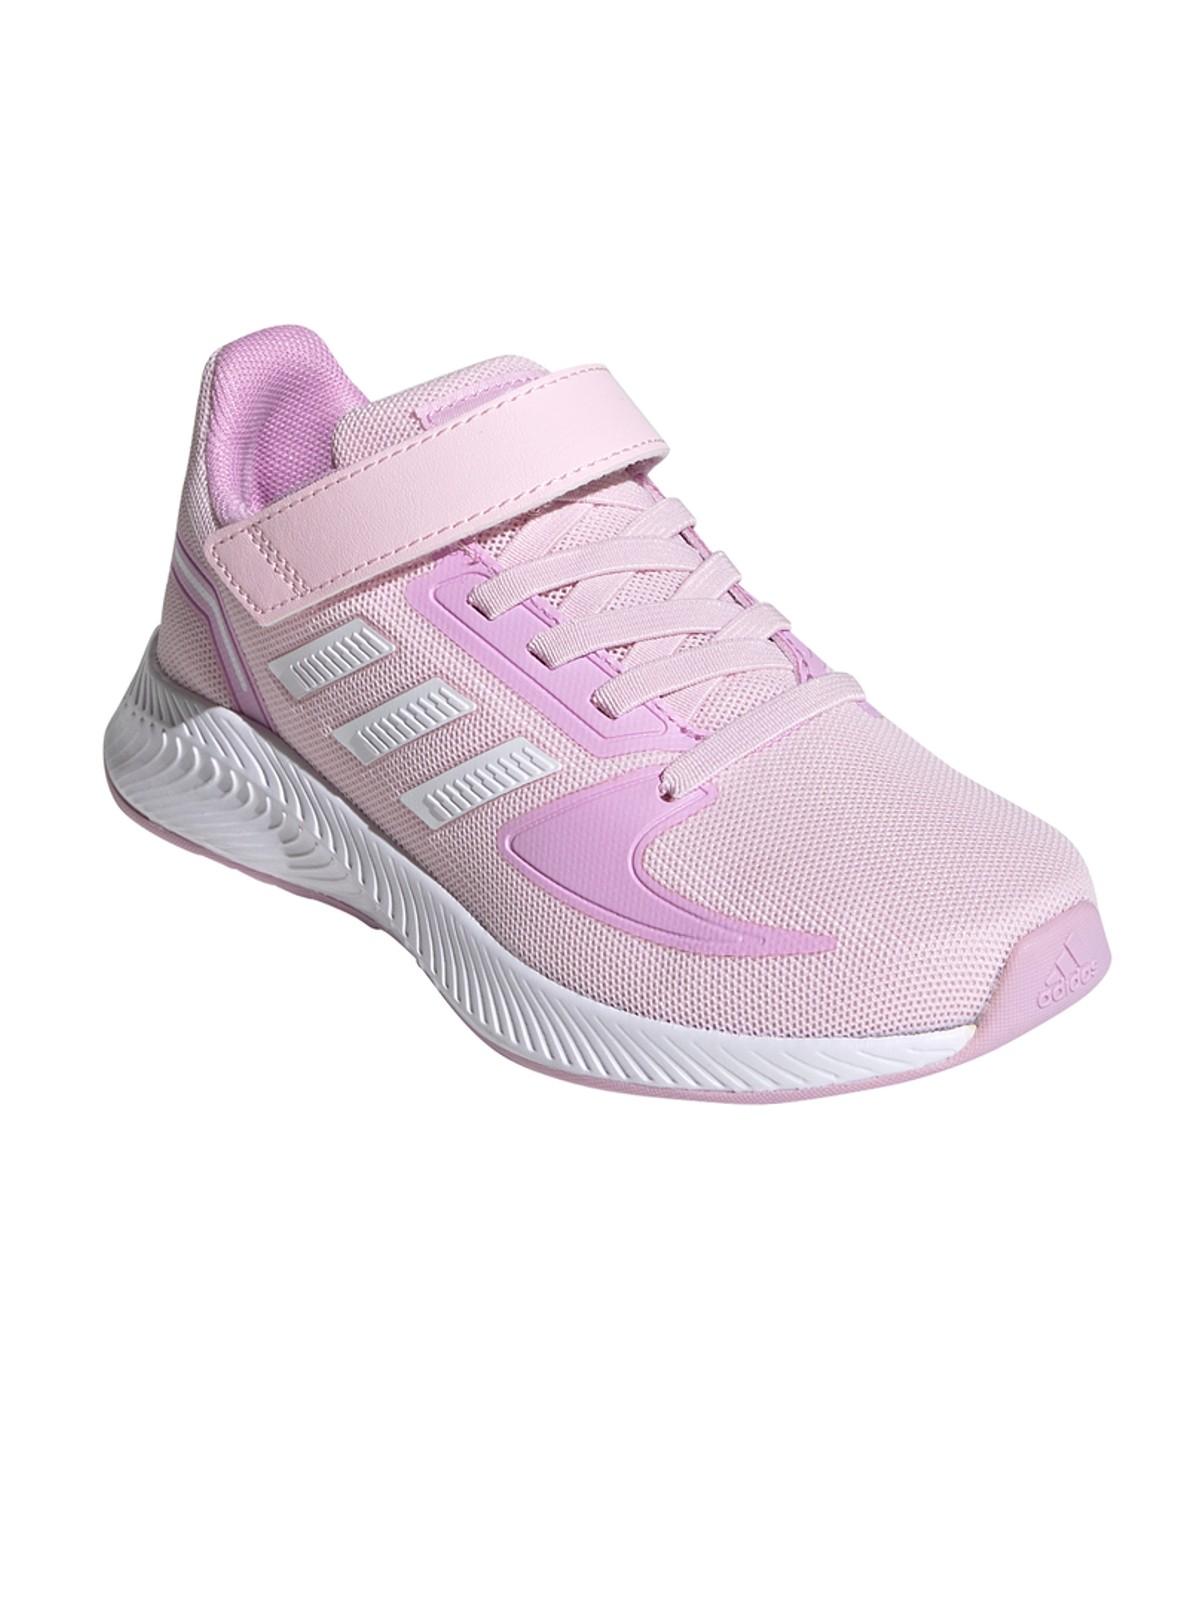 Baskets adidas rose fille (28-33) - DistriCenter